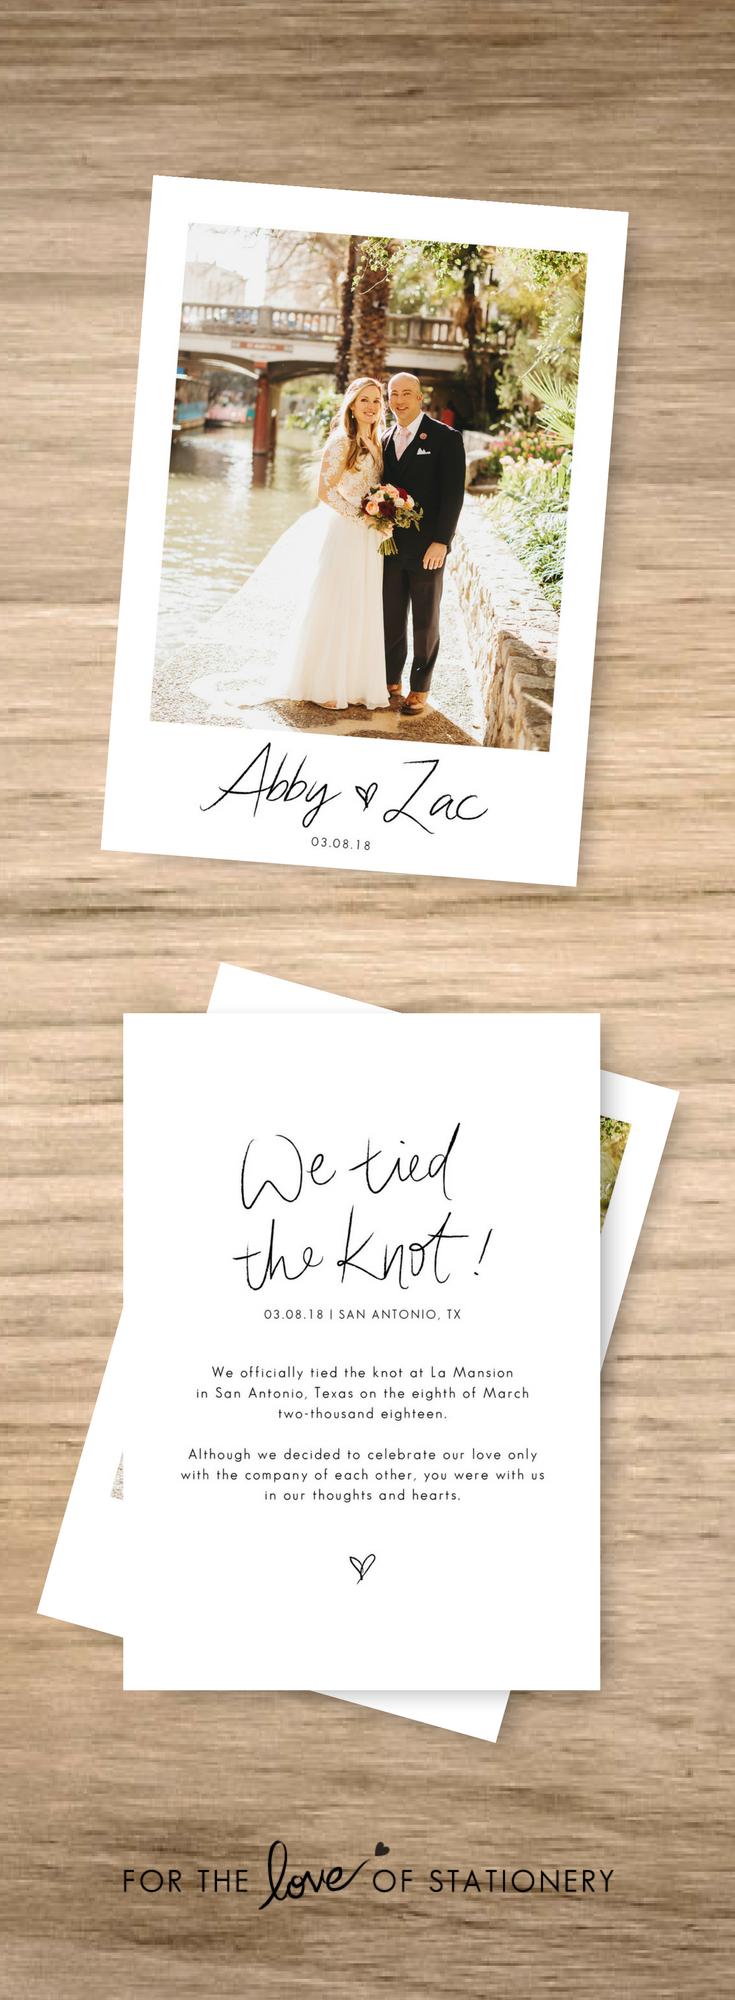 We Eloped Elope Invitation Elopement Announcement Rustic Weddings Wedding Ideas